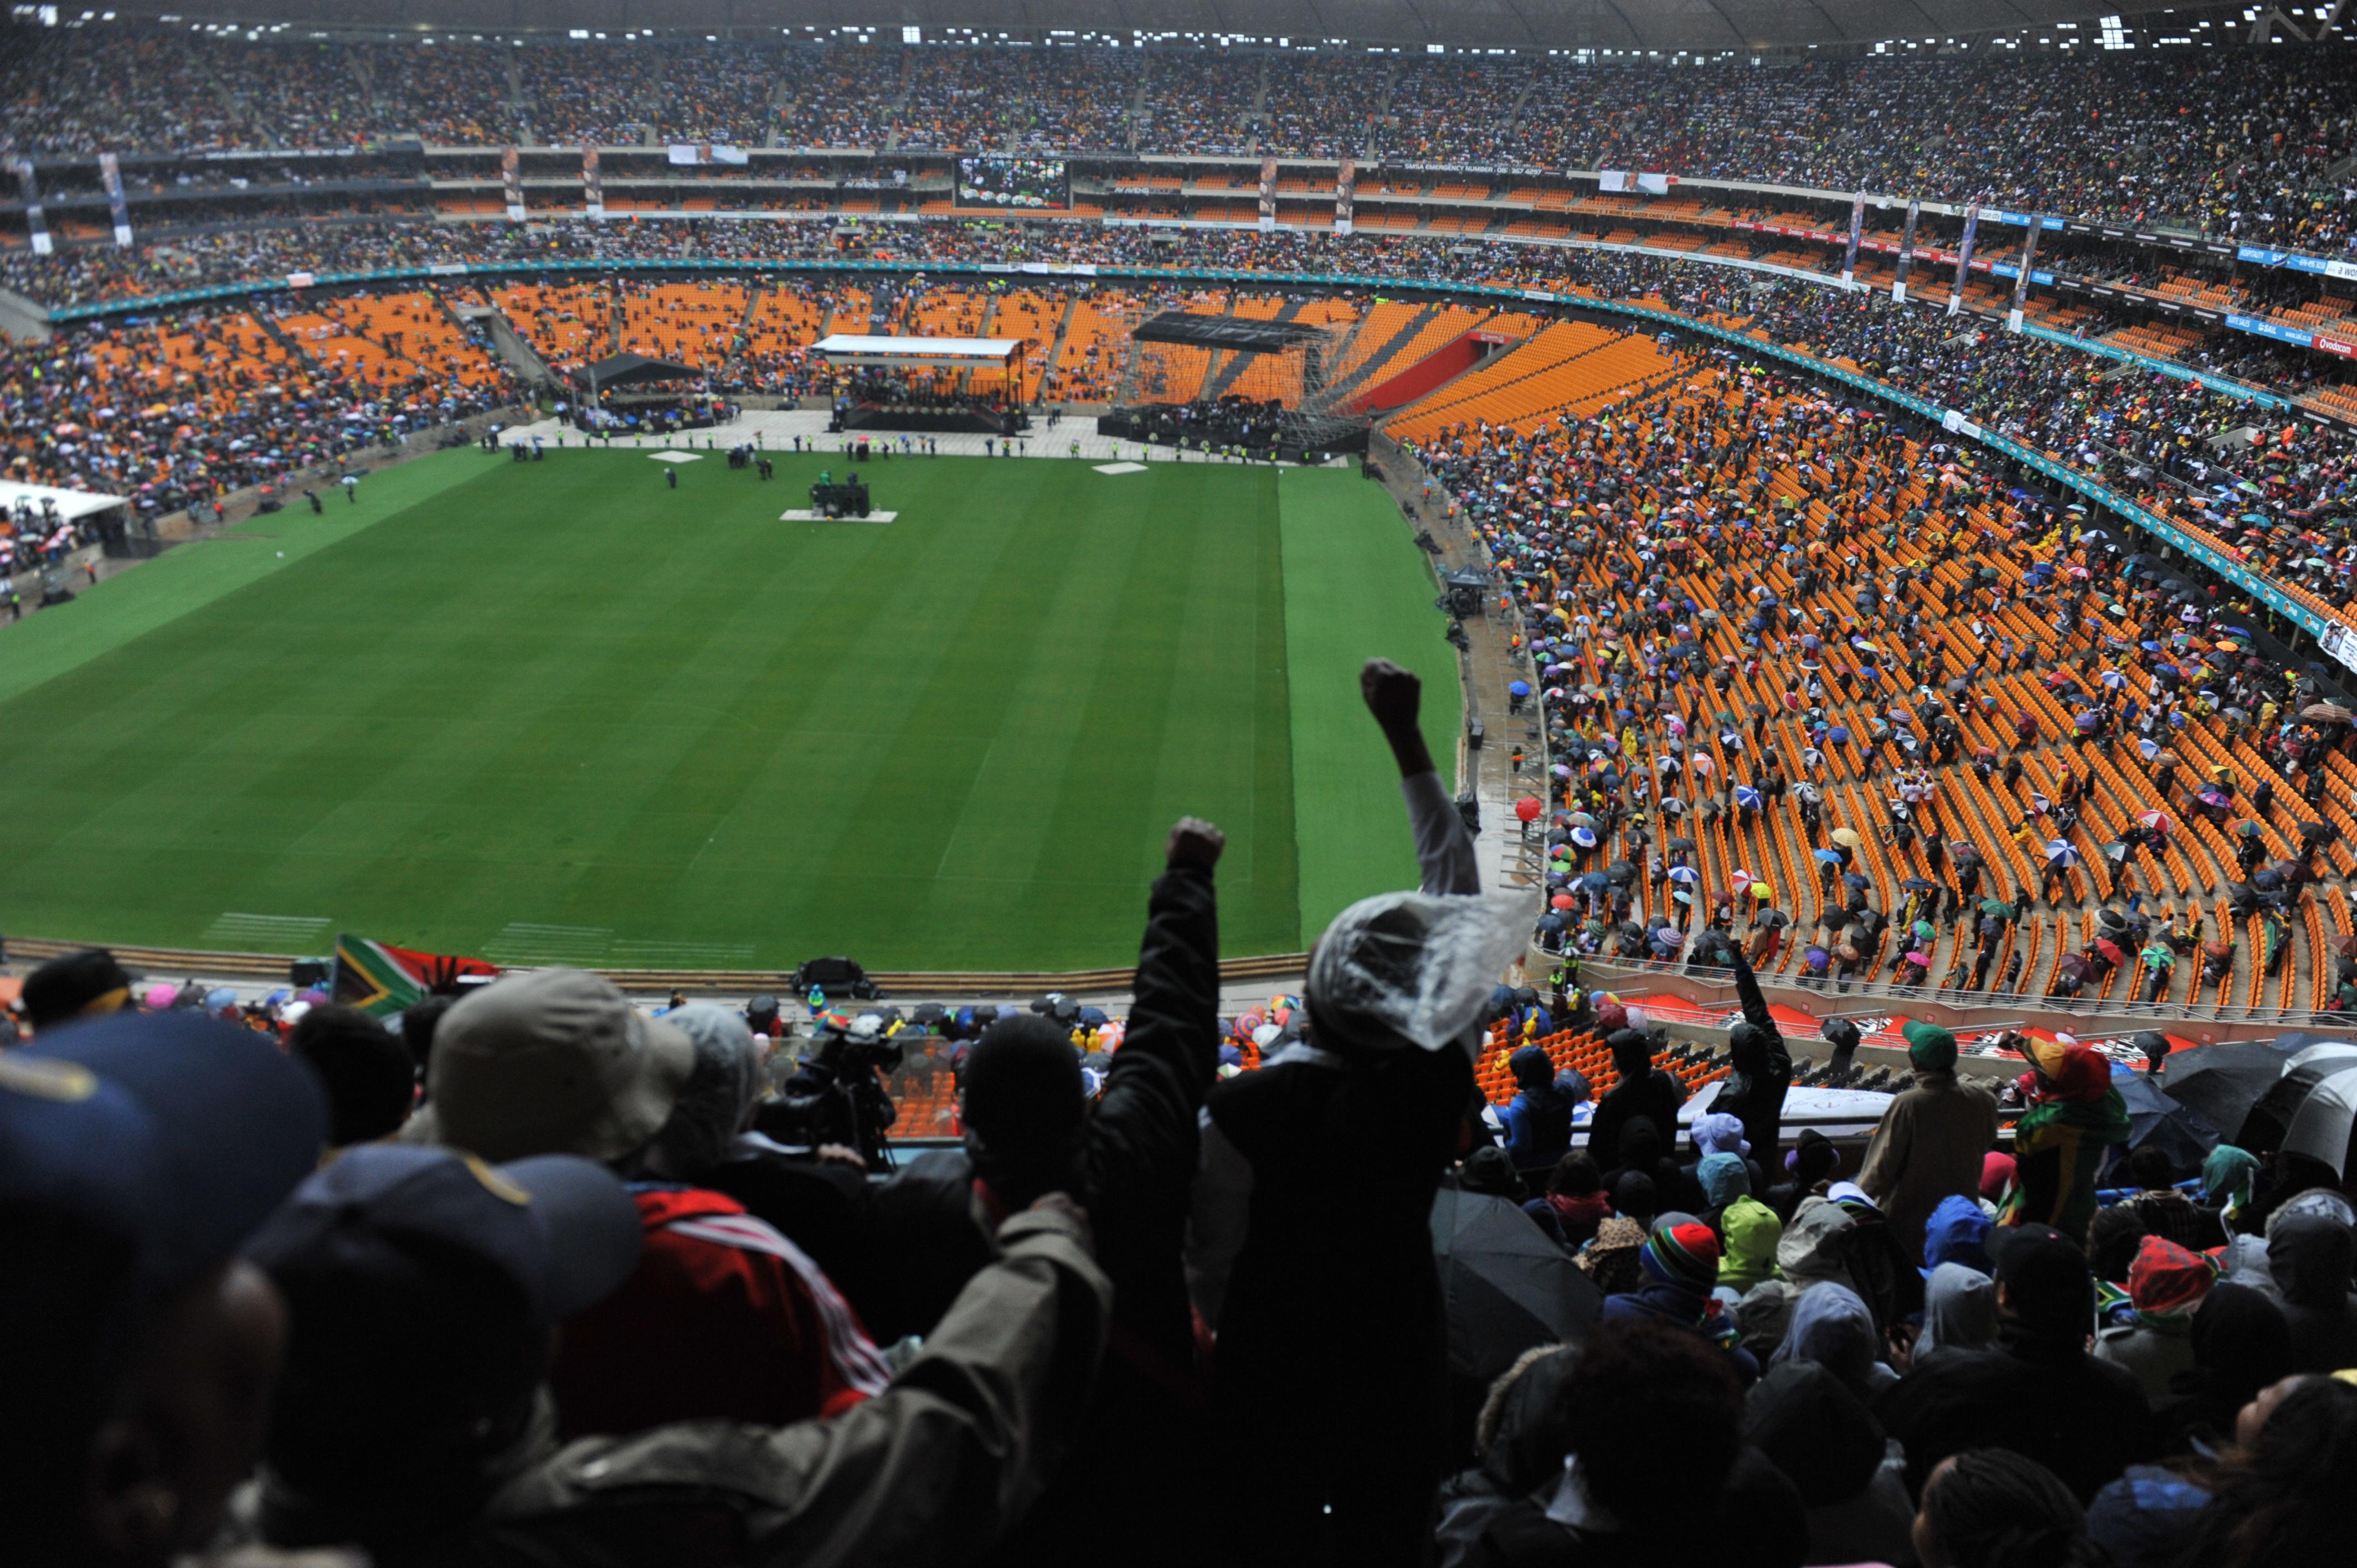 Fnb Stadium Soccer City Johannesburg South Africa